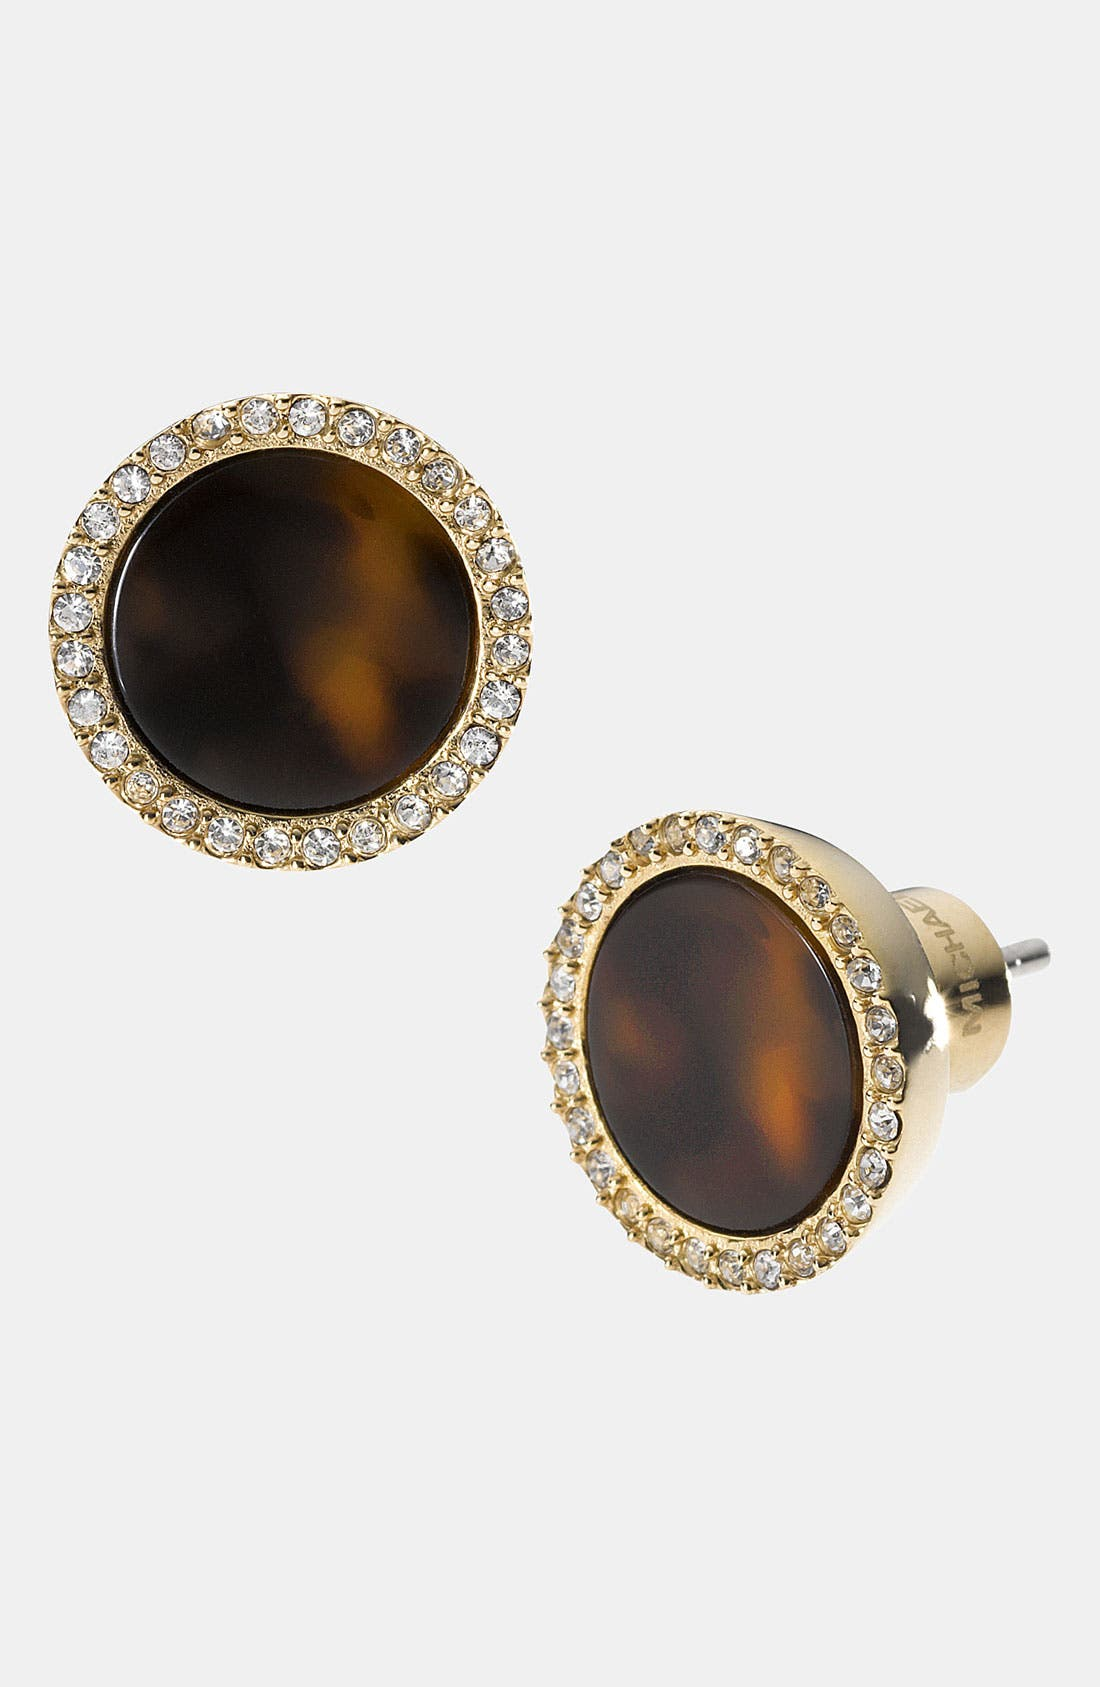 Michael Kors 'Brilliance' Stud Earrings,                         Main,                         color, Tortoise/ Clear/ Gold